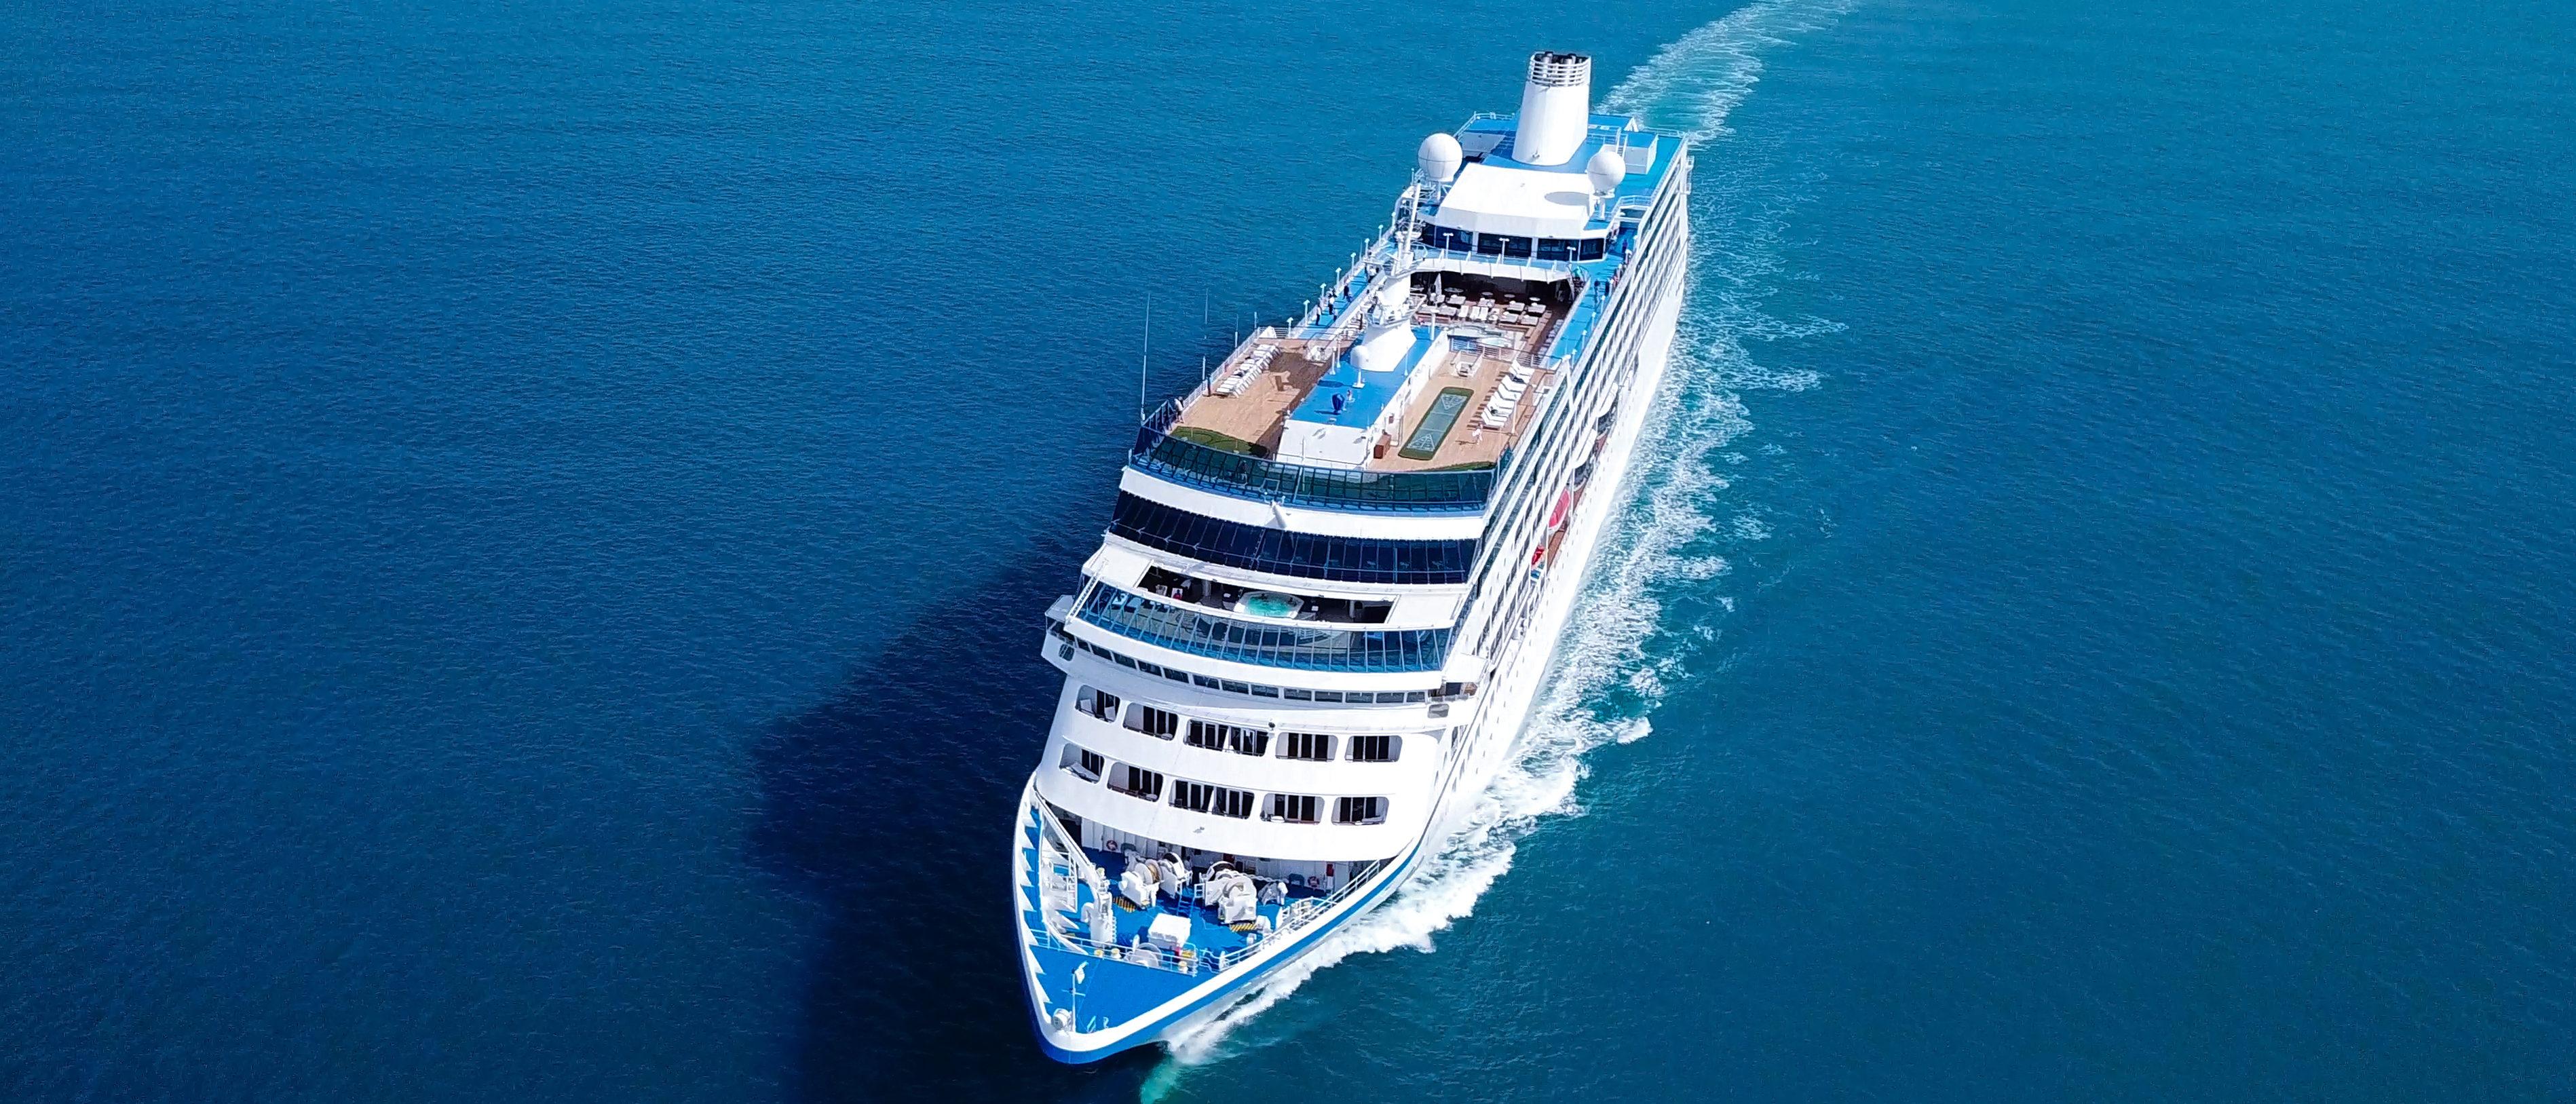 Cruise Ship on Ocean (Shutterstock/StockStudio)